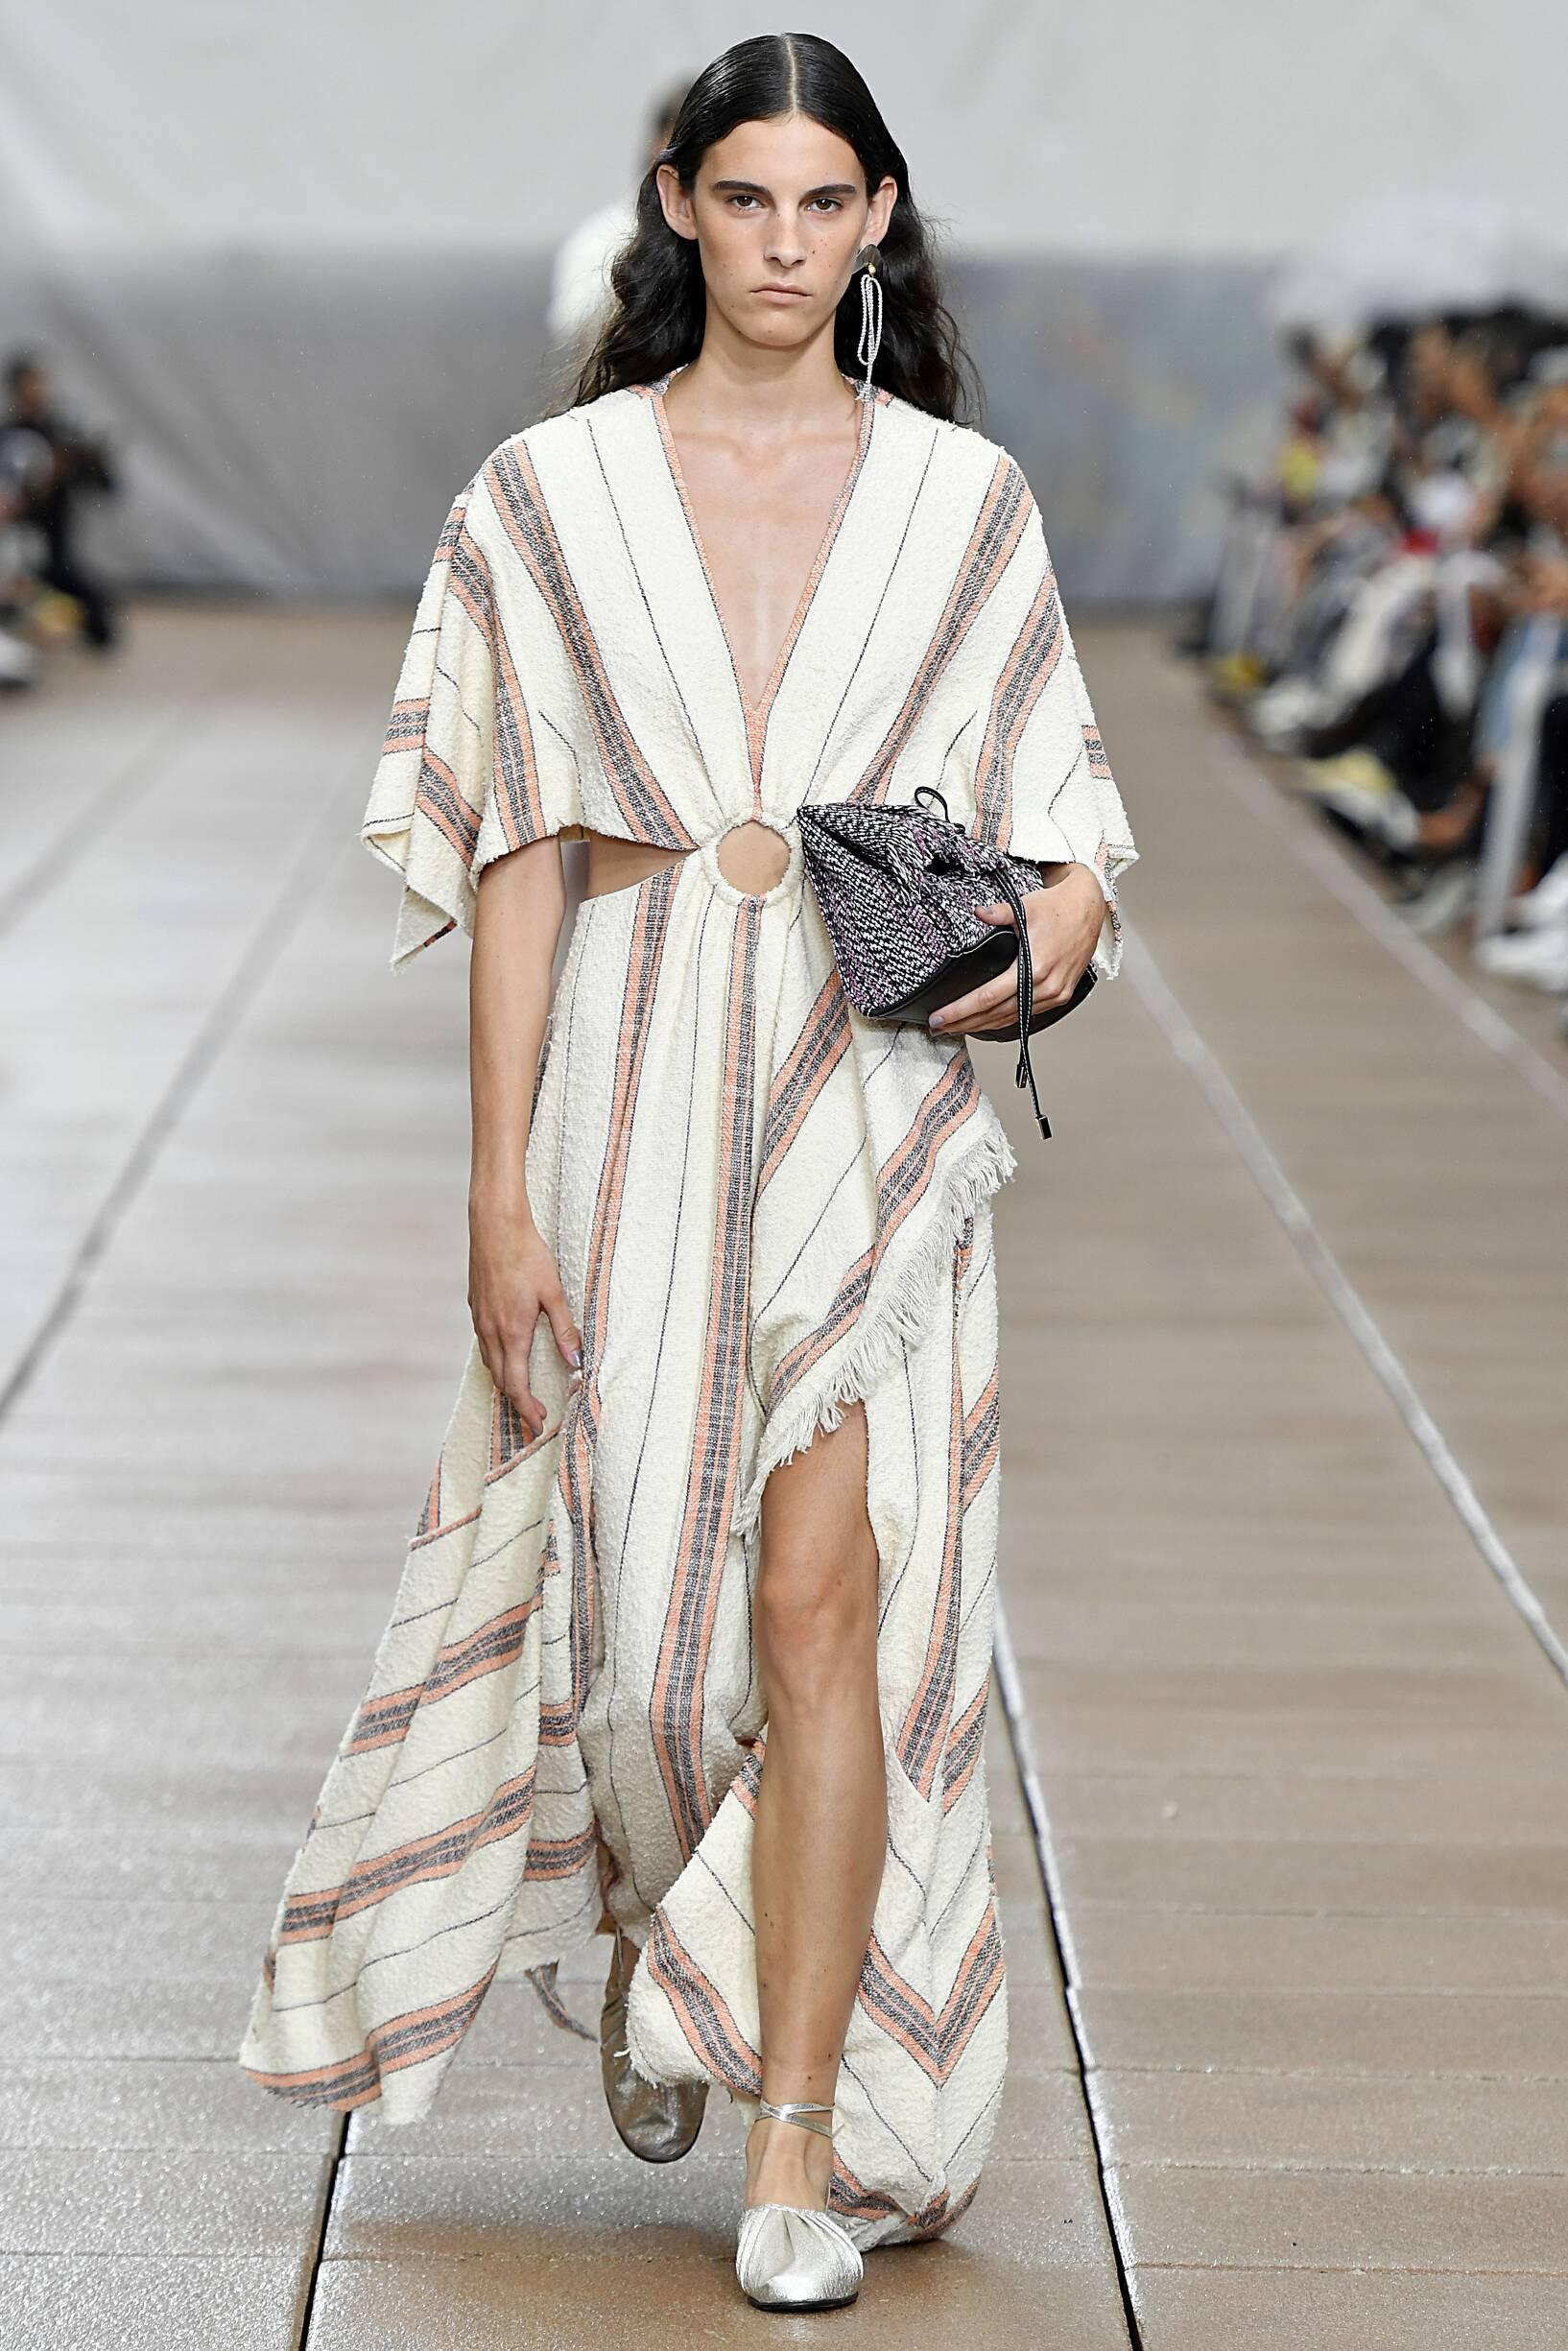 Model Fashion Show 3.1 Phillip Lim